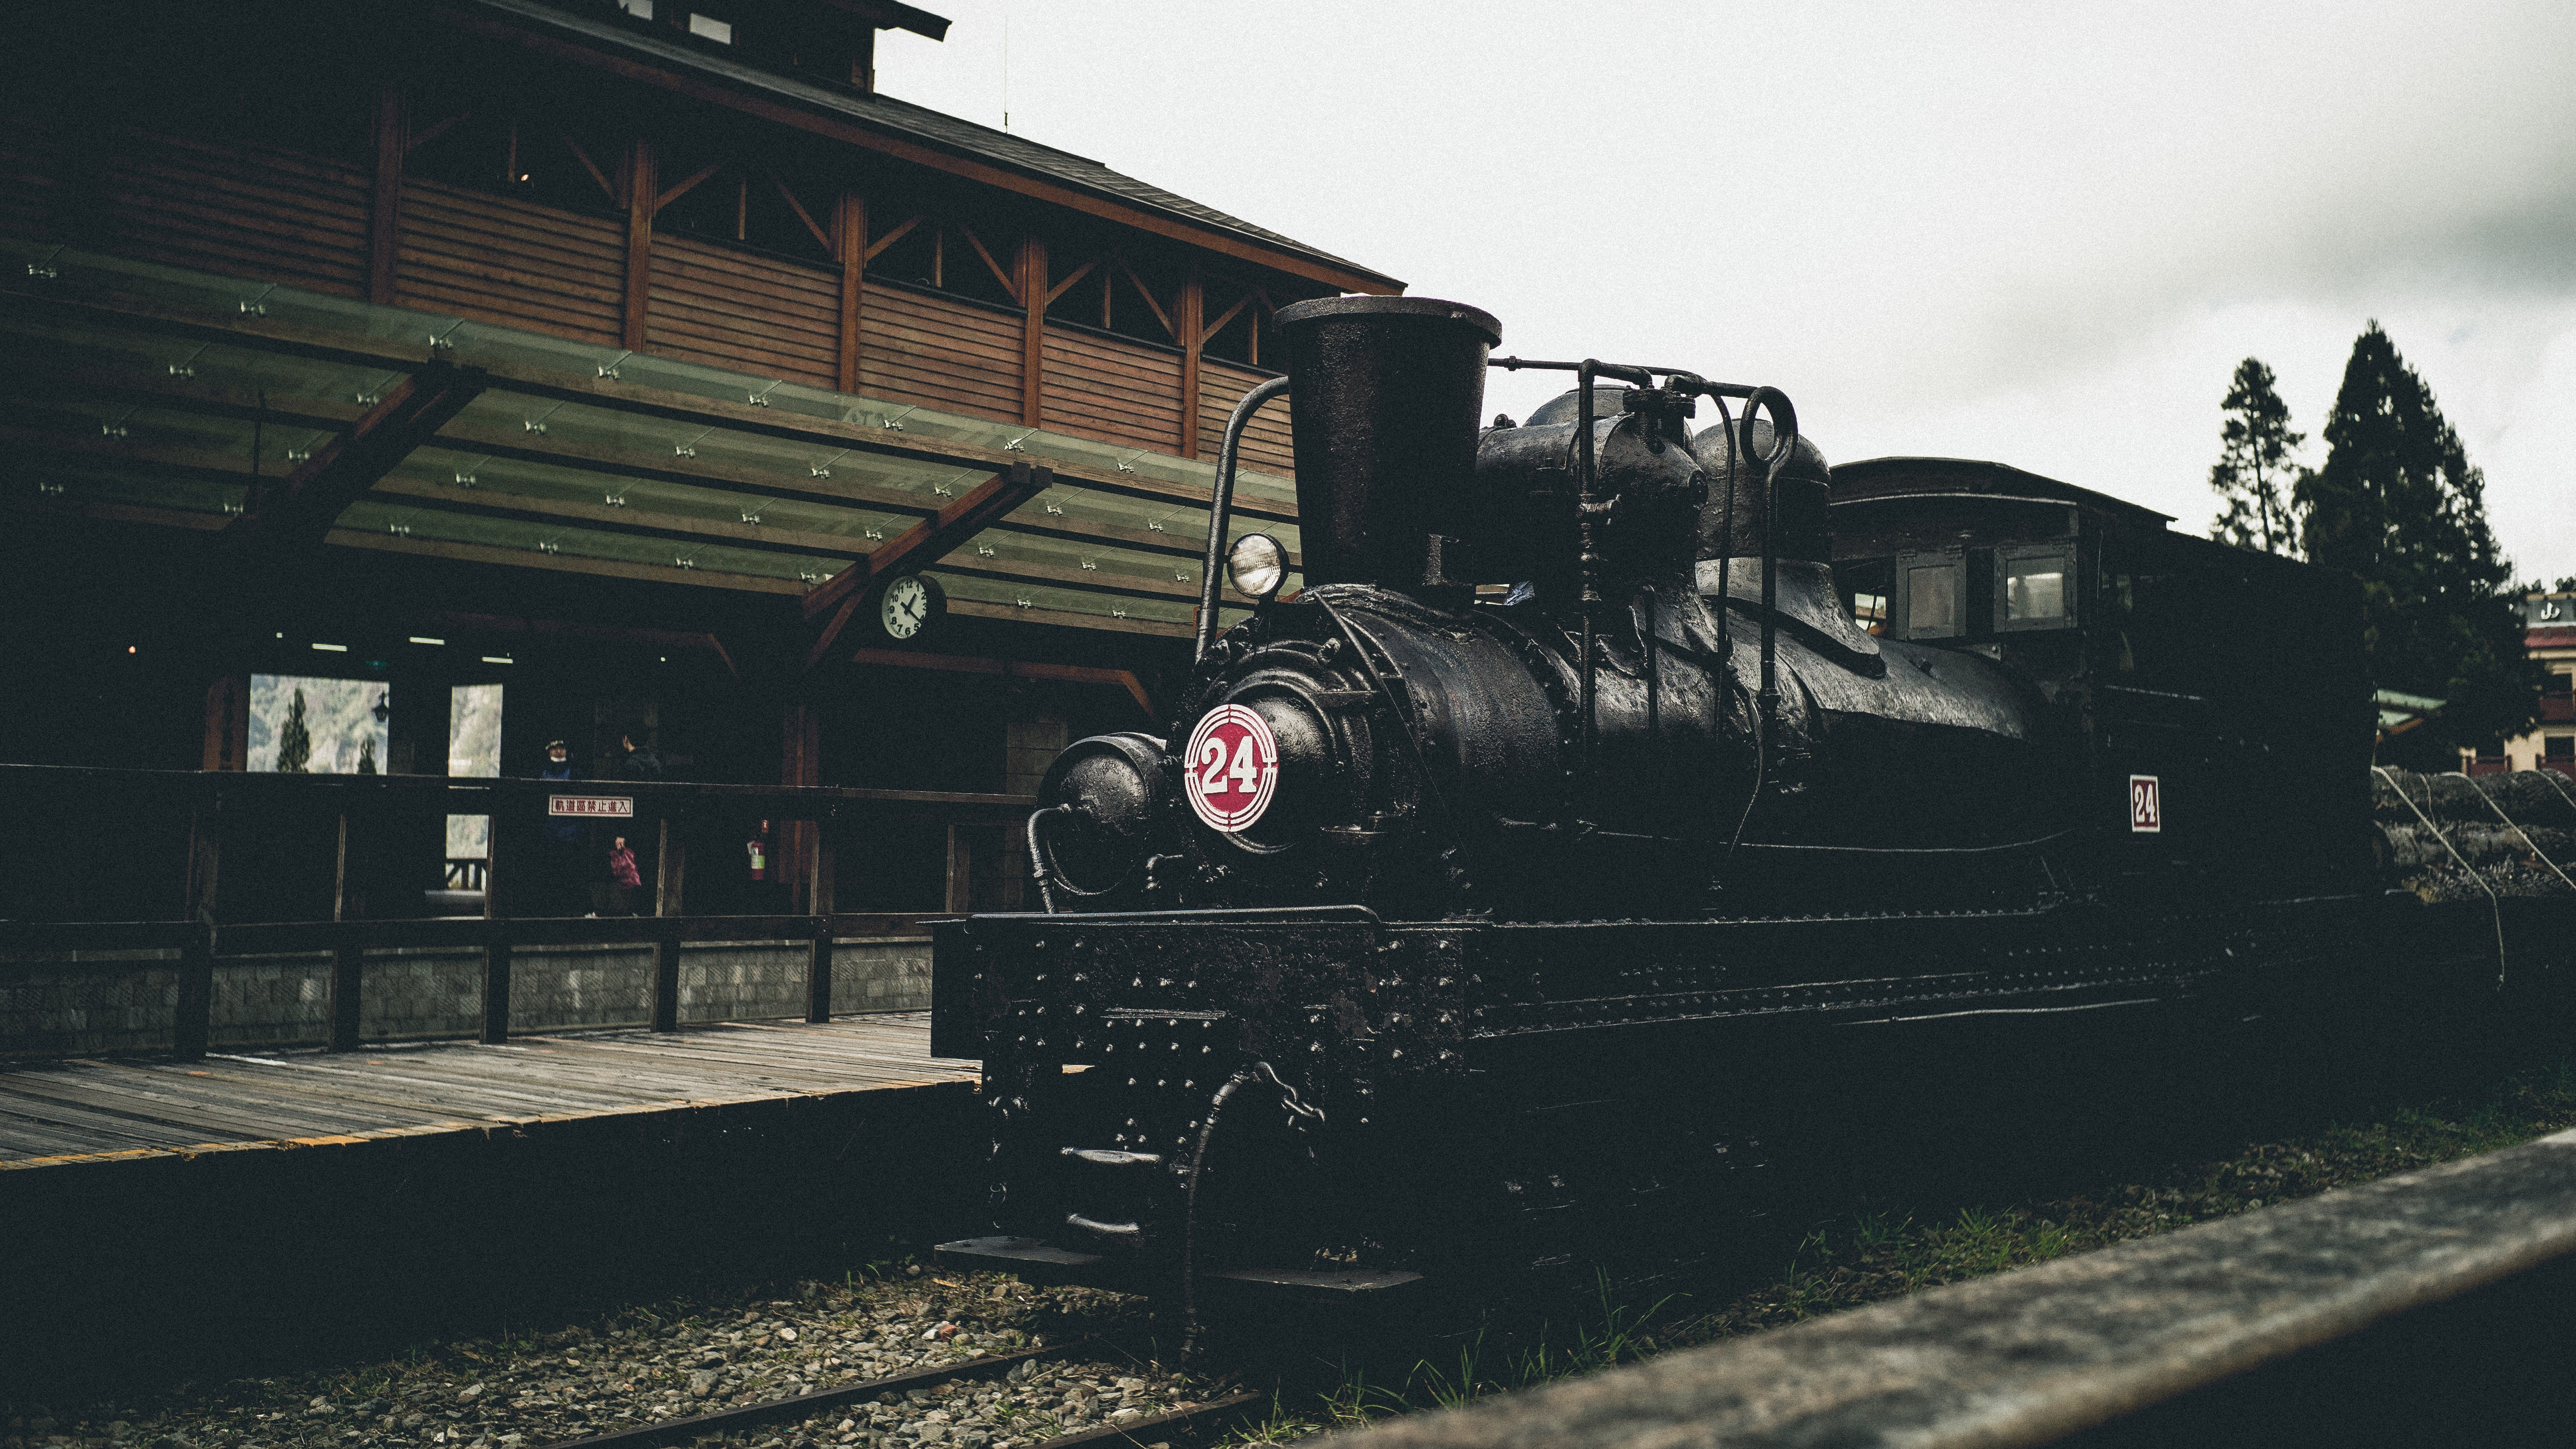 black train near brown wooden establishment